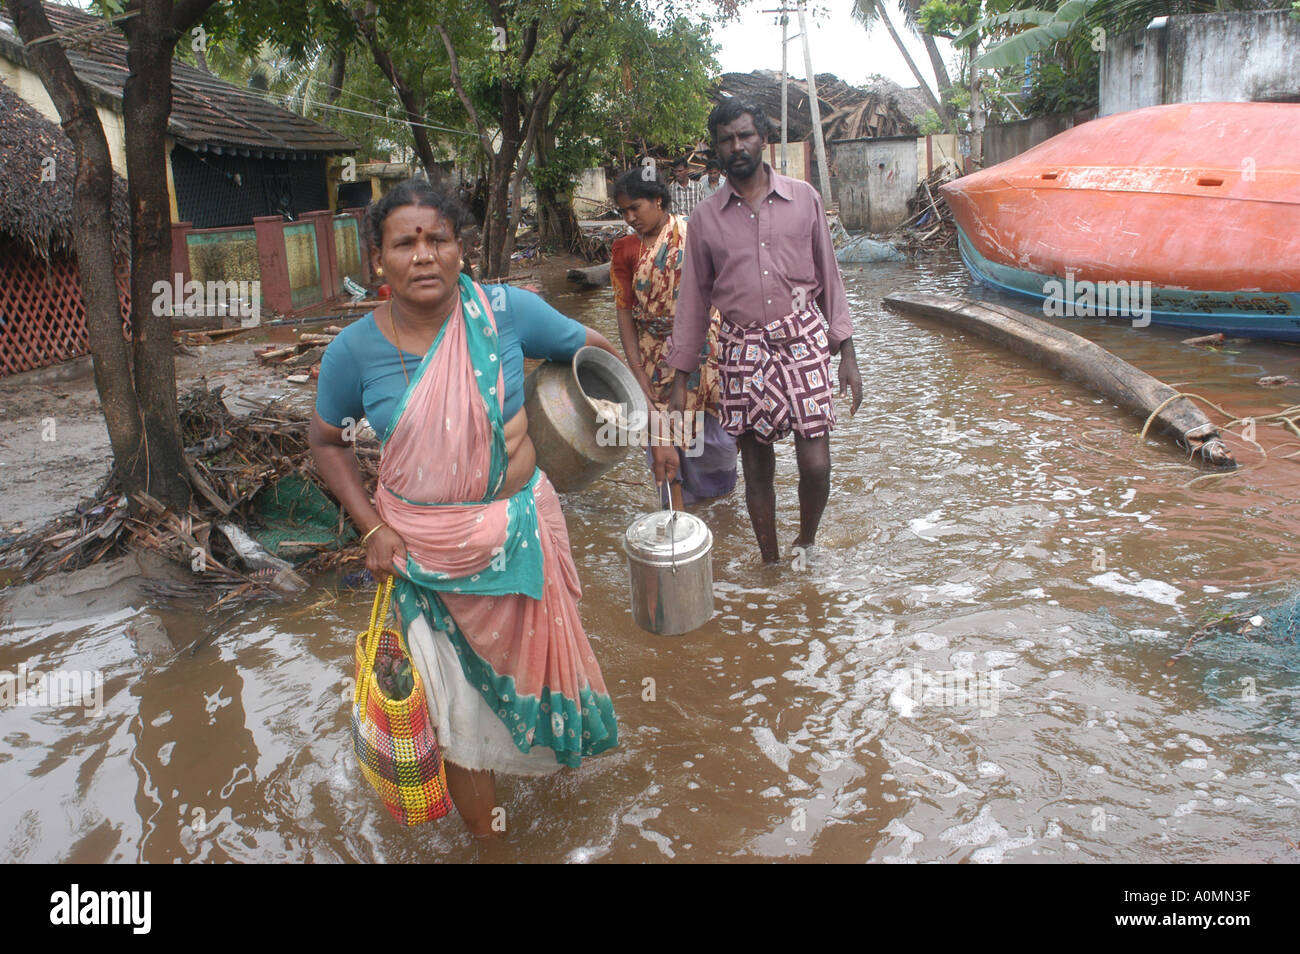 MPD92712 Damage by natural disaster Tsunami earthquake on sea floor Nagapattinum Velankanni Tamil Nadu Indian Ocean - Stock Image